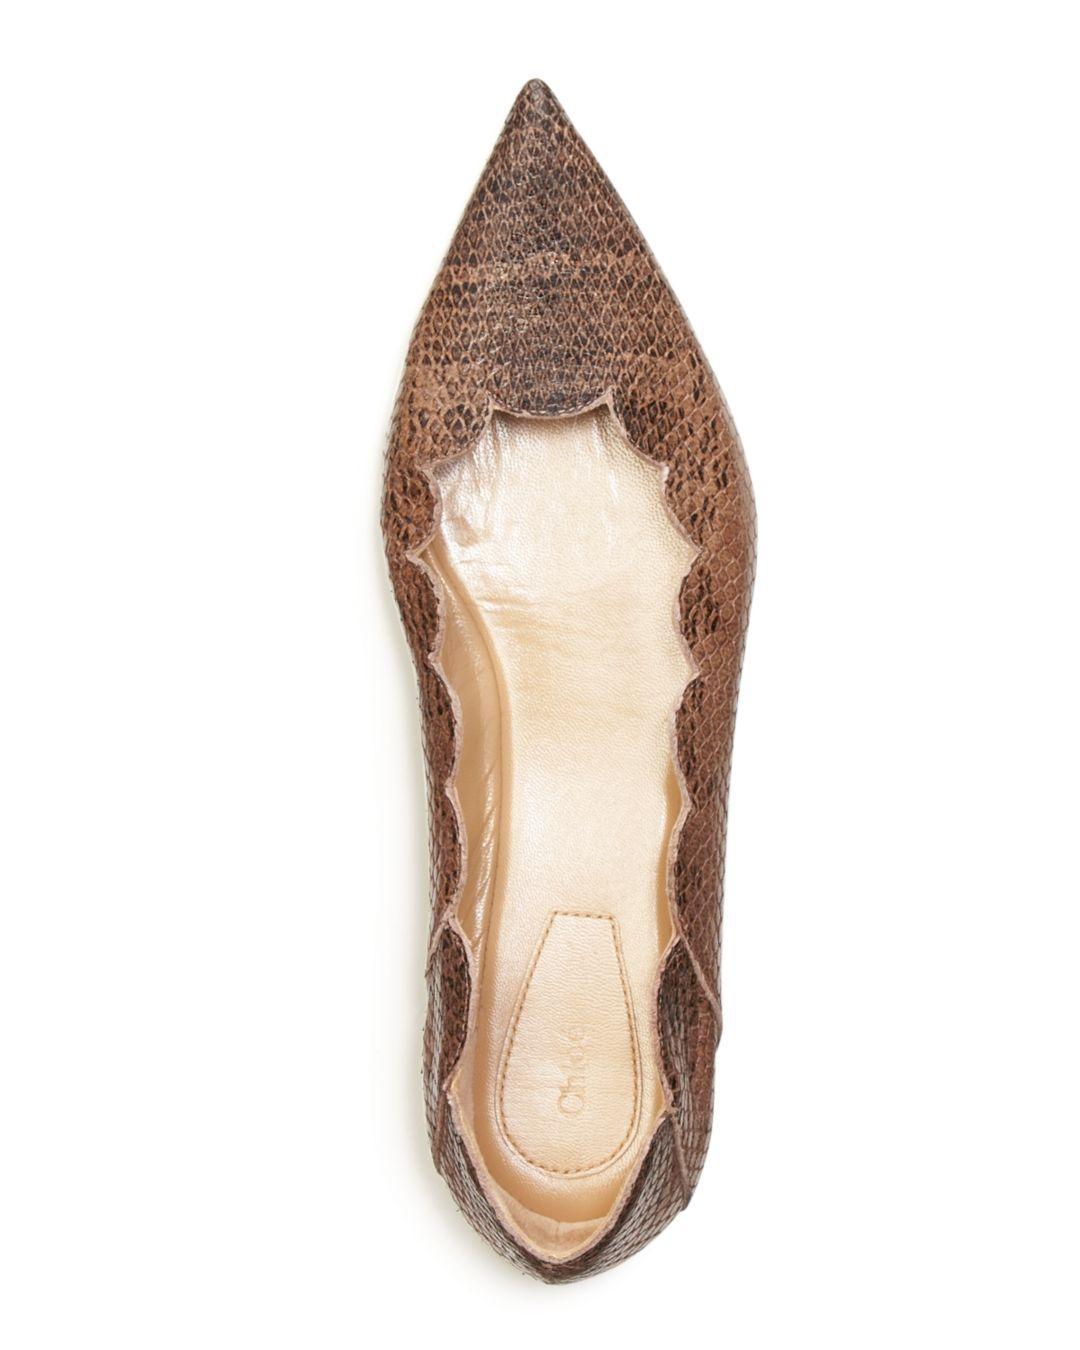 850cbbfc03f Chloé Women's Lauren Pointed Toe Ballerina Flats in Brown - Lyst